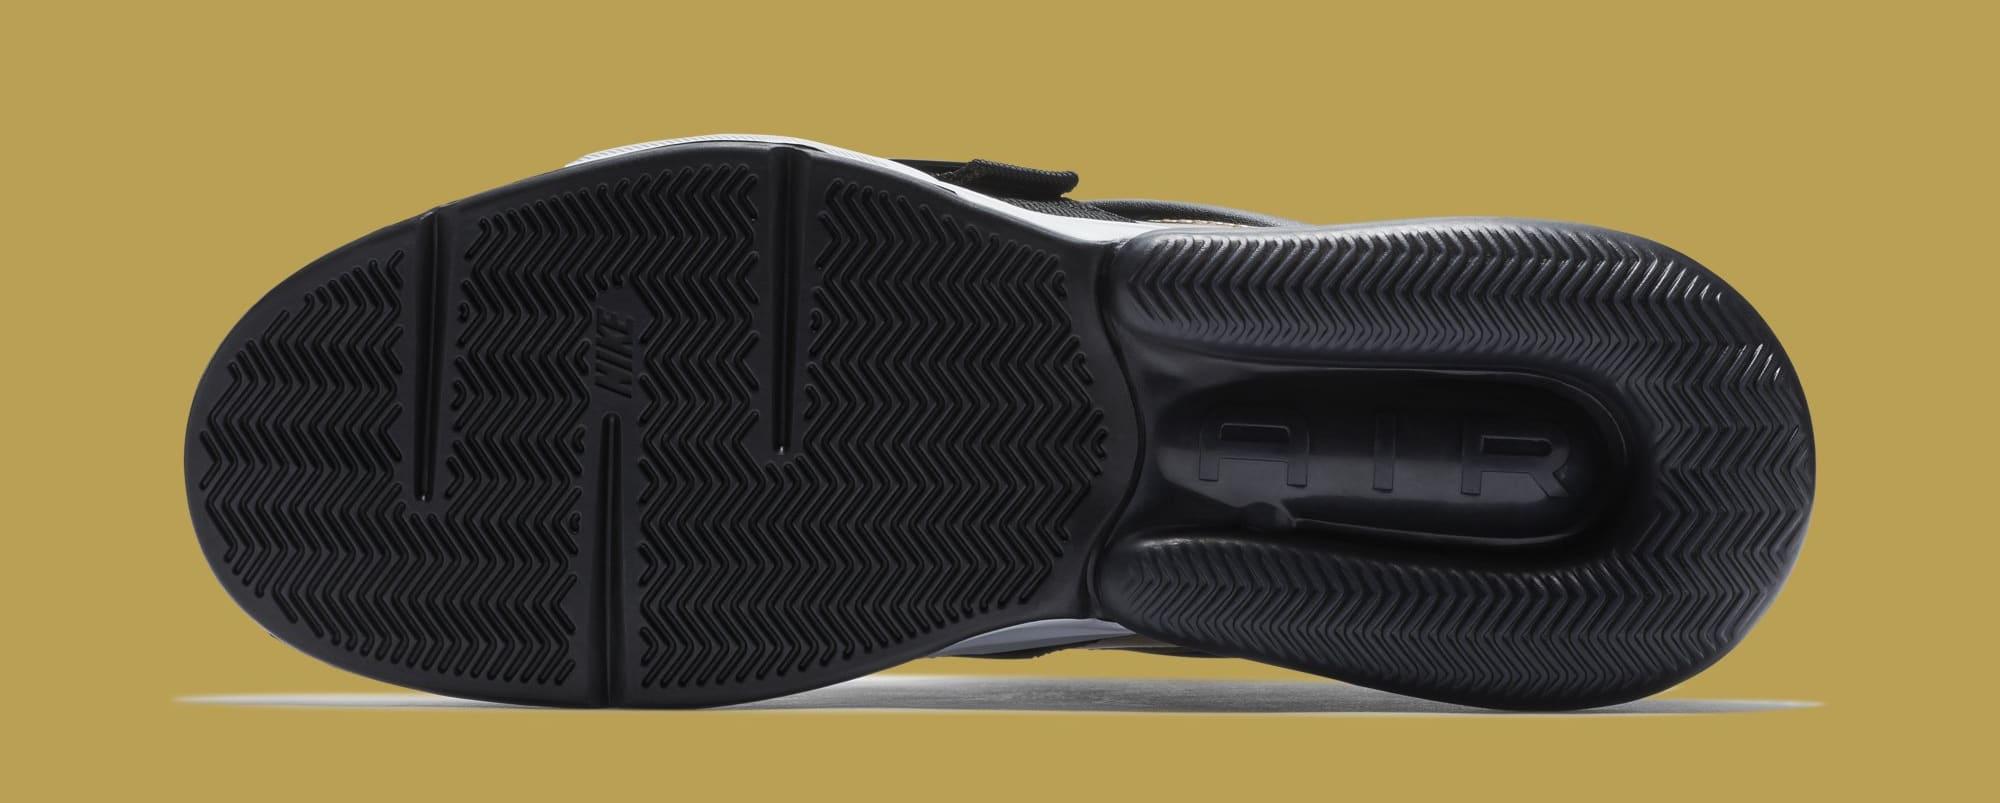 Release Qs Force DateSole 'gold At5752 Standard' 700 Nike Air 270 BtxshoQrdC